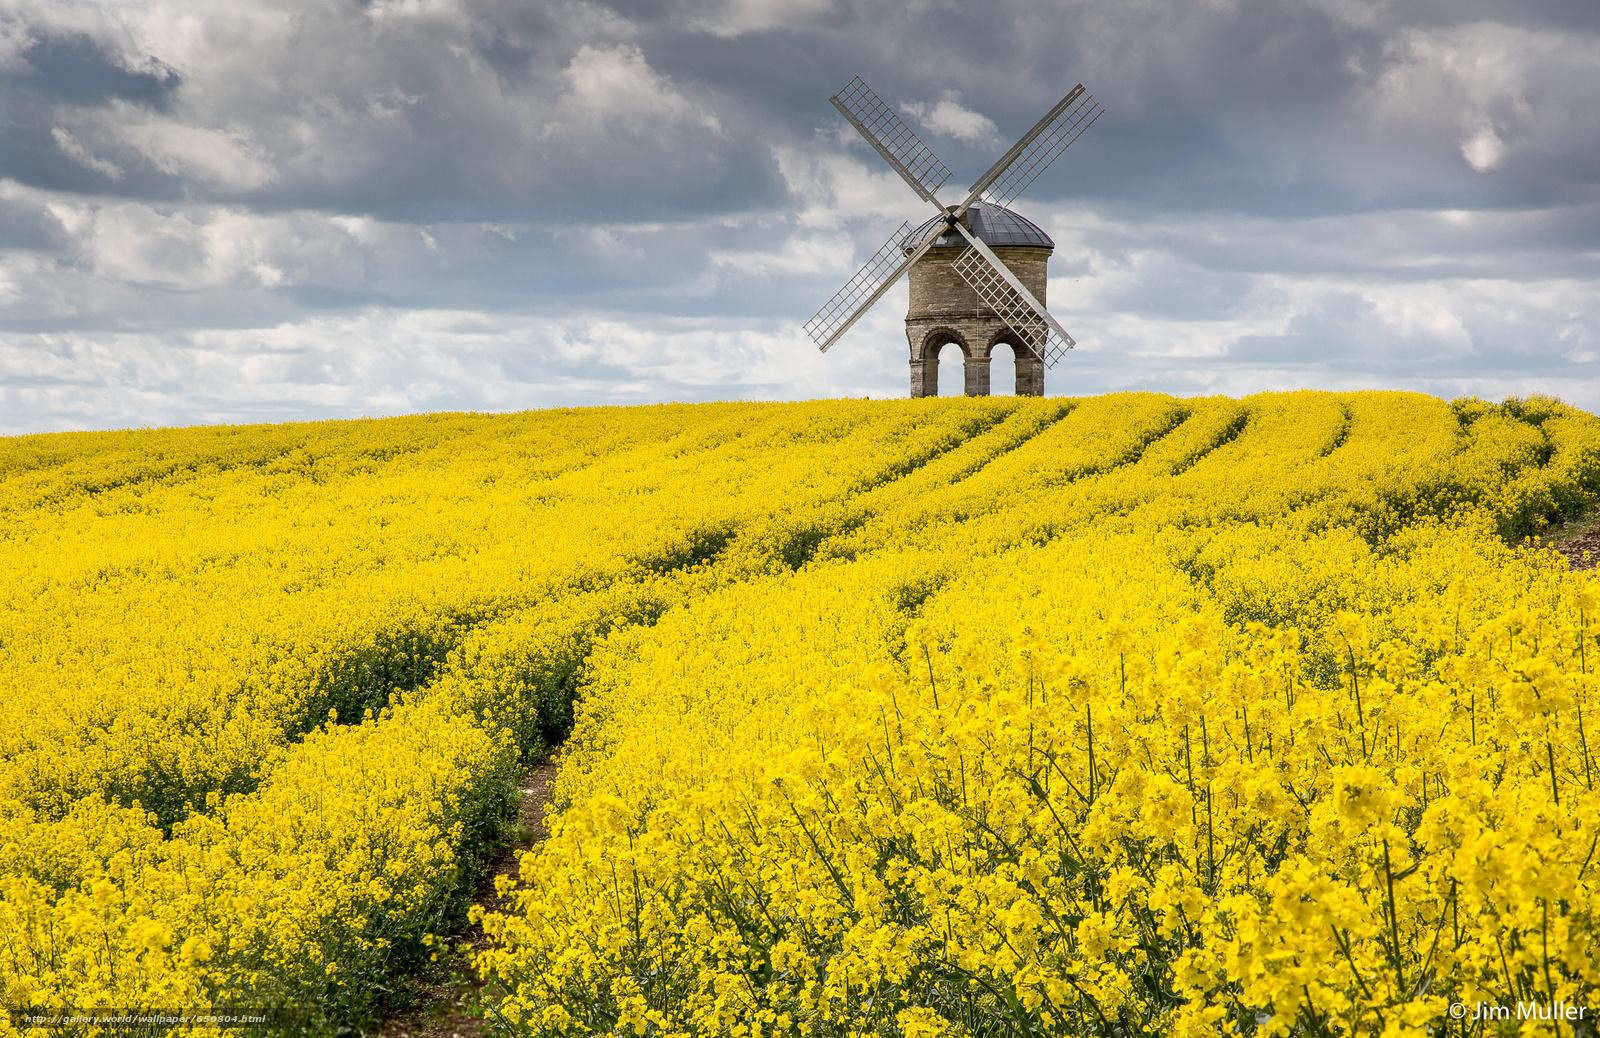 Warwickshire United Kingdom  city images : Download wallpaper Chesterton Windmill, Warwickshire, United Kingdom ...